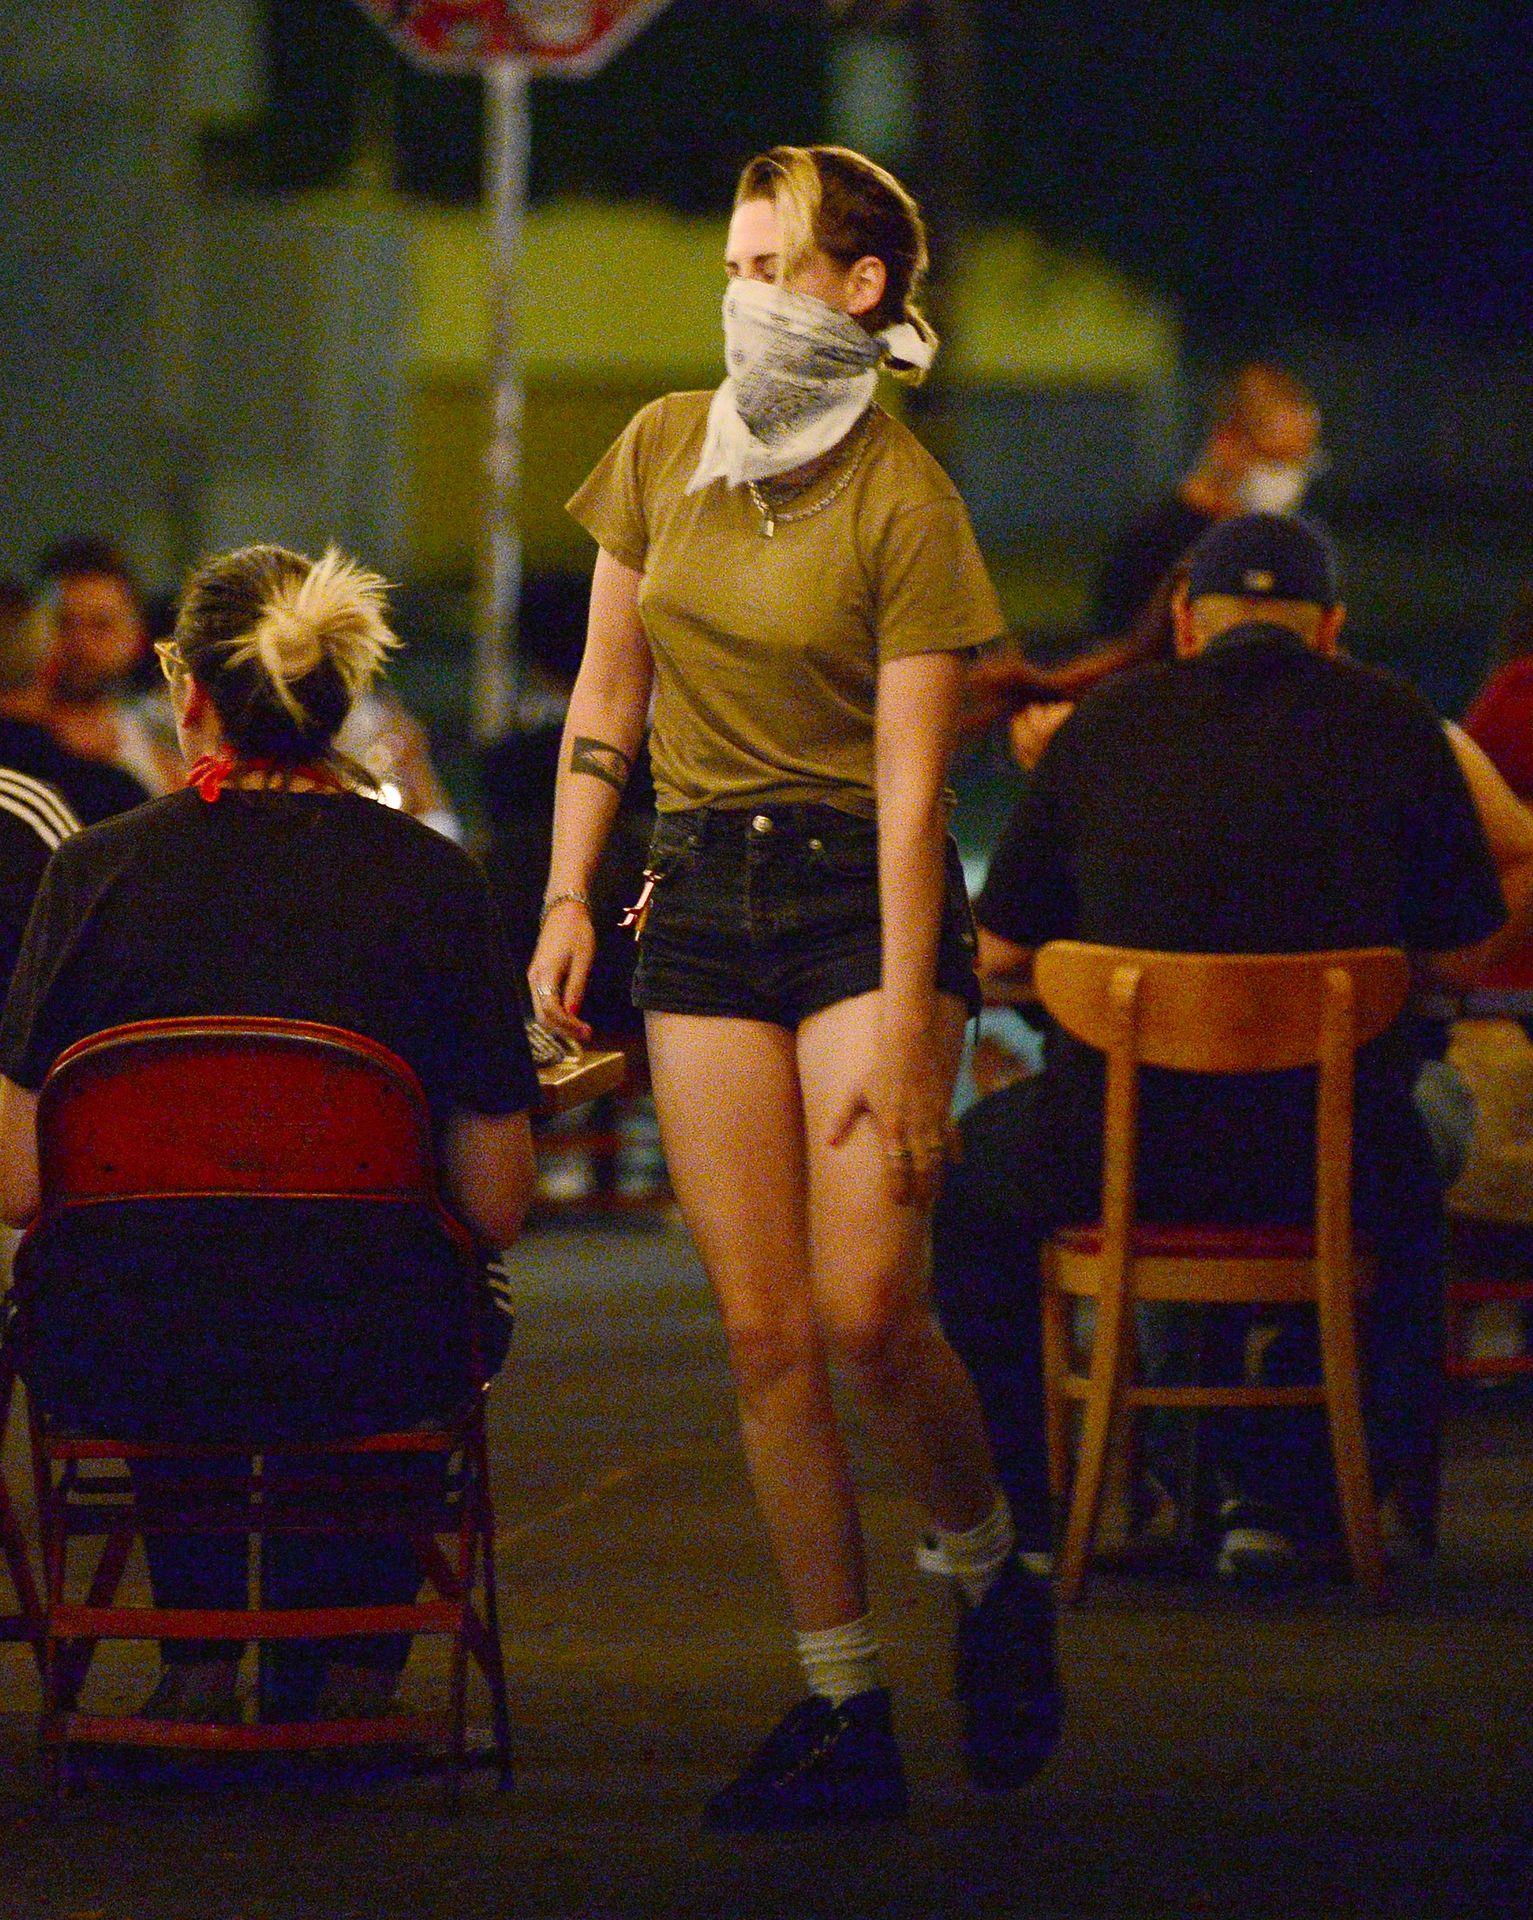 Kristen-Stewart-Dylan-Meyer-Sexy-The-Fappening-Blog-47.jpg